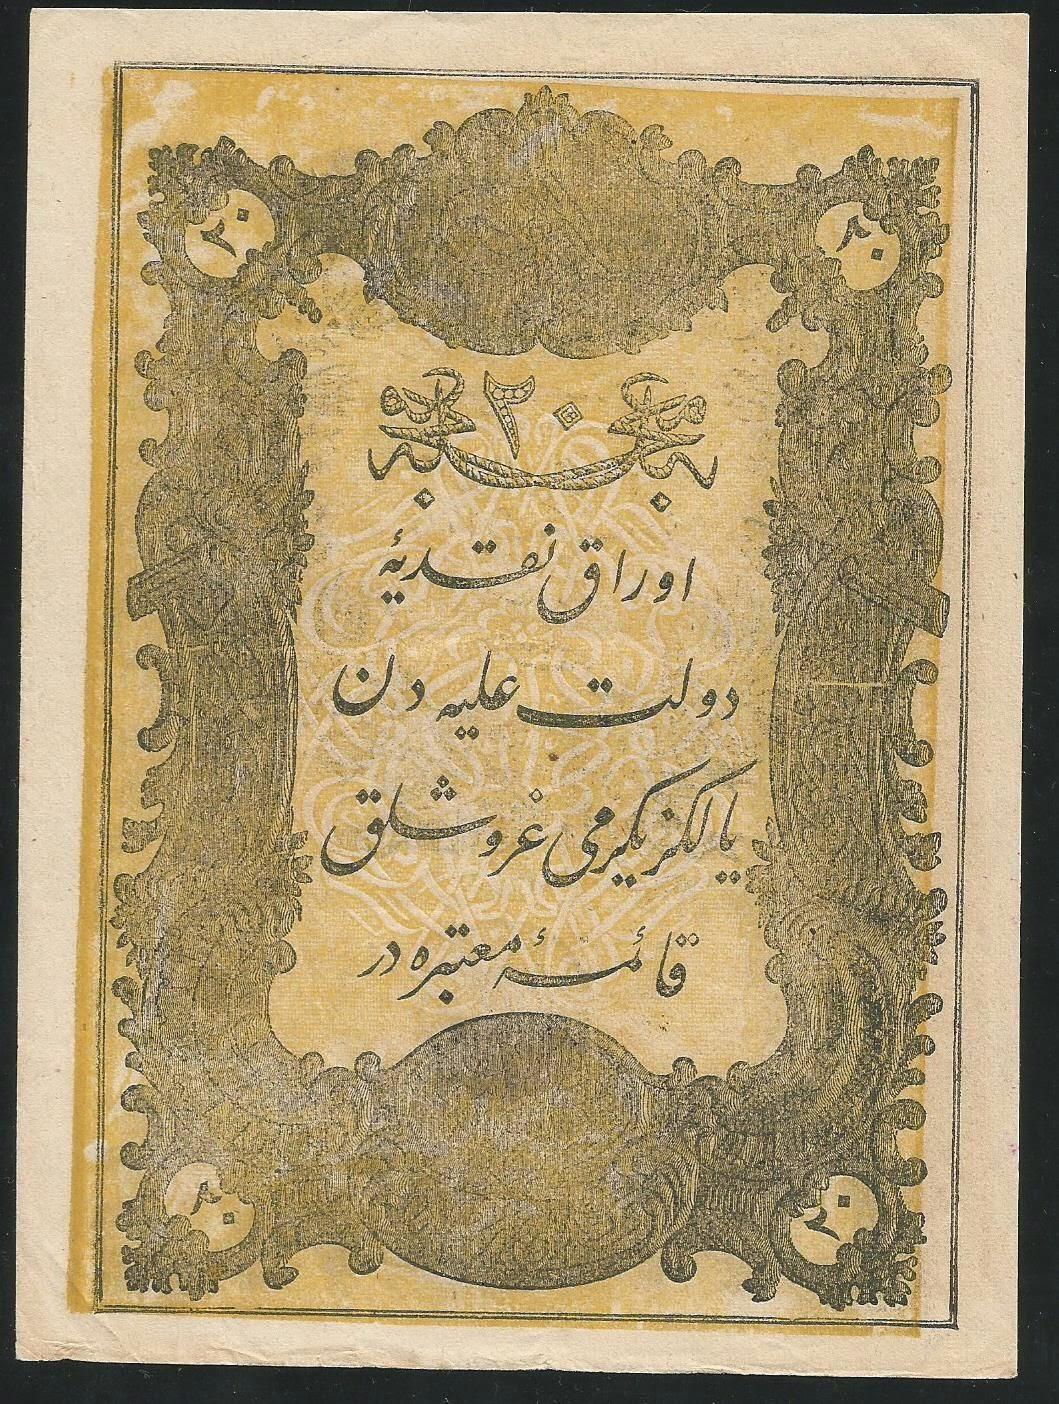 Ottoman Empire 20 Kuruş Banknote 1861 World Banknotes